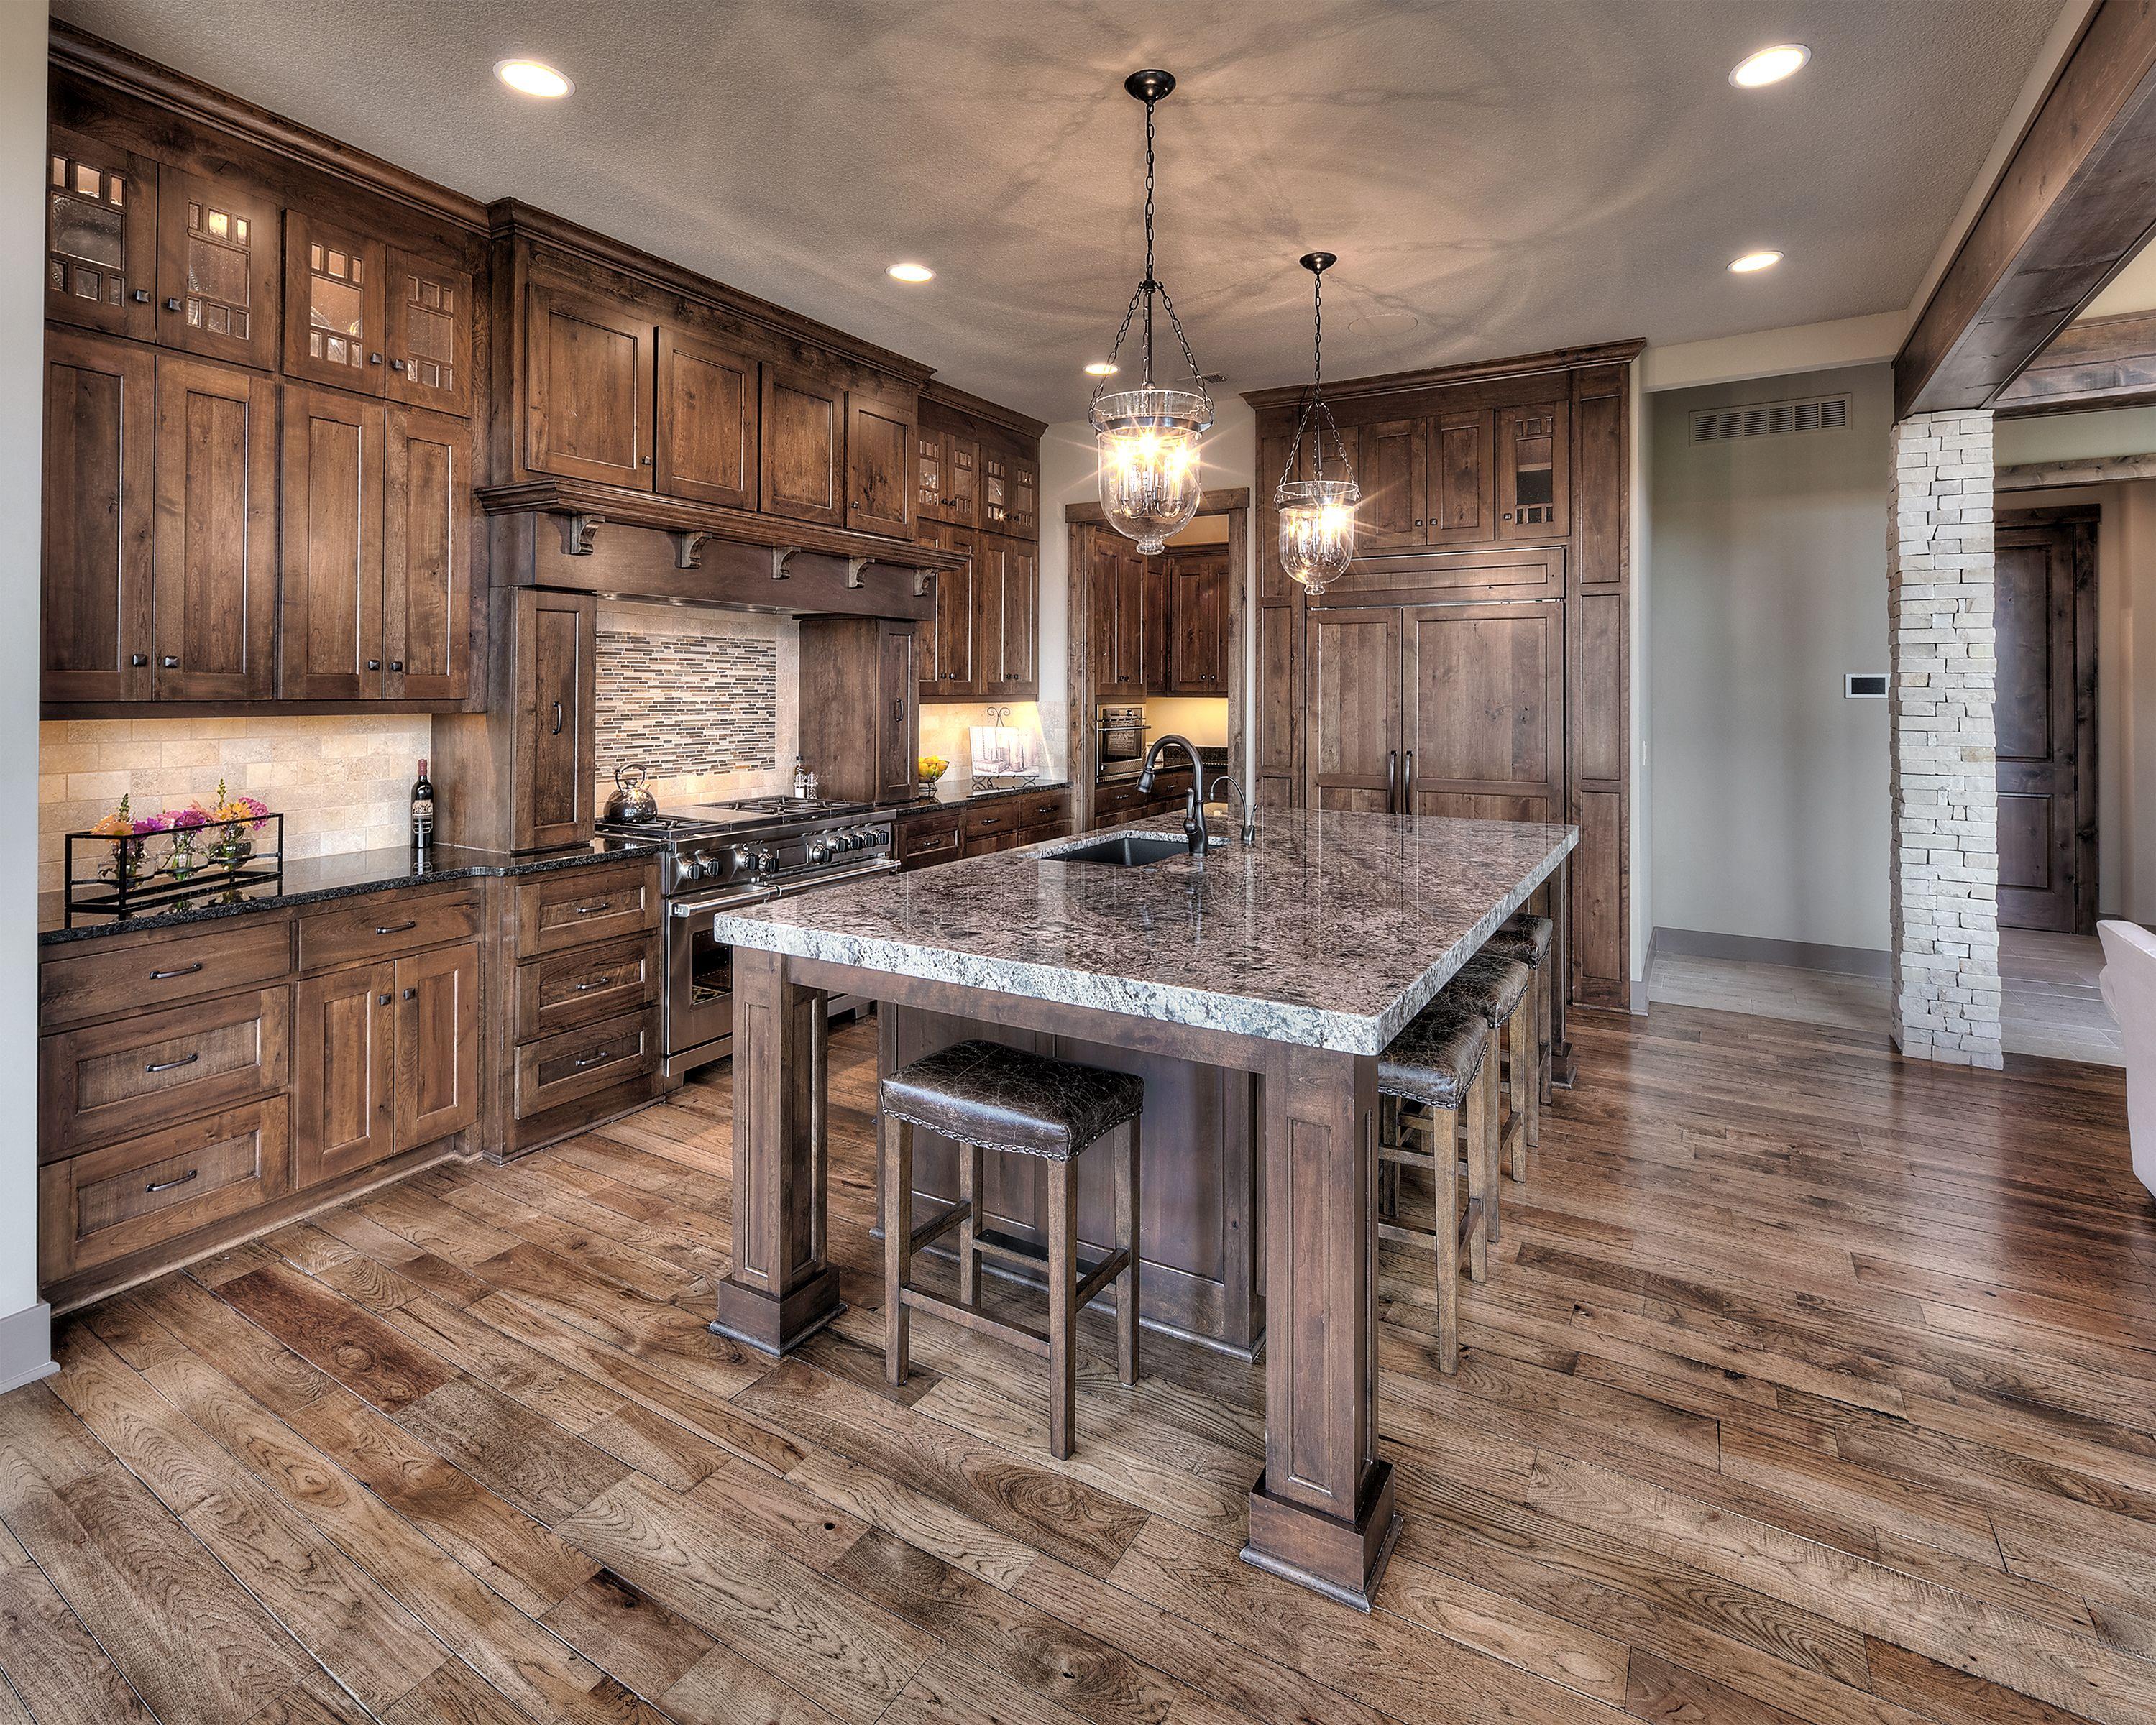 kitchen dark hardwood large kitchen island cabinet lighting rustic kitchen design on kitchen decor themes rustic id=16830